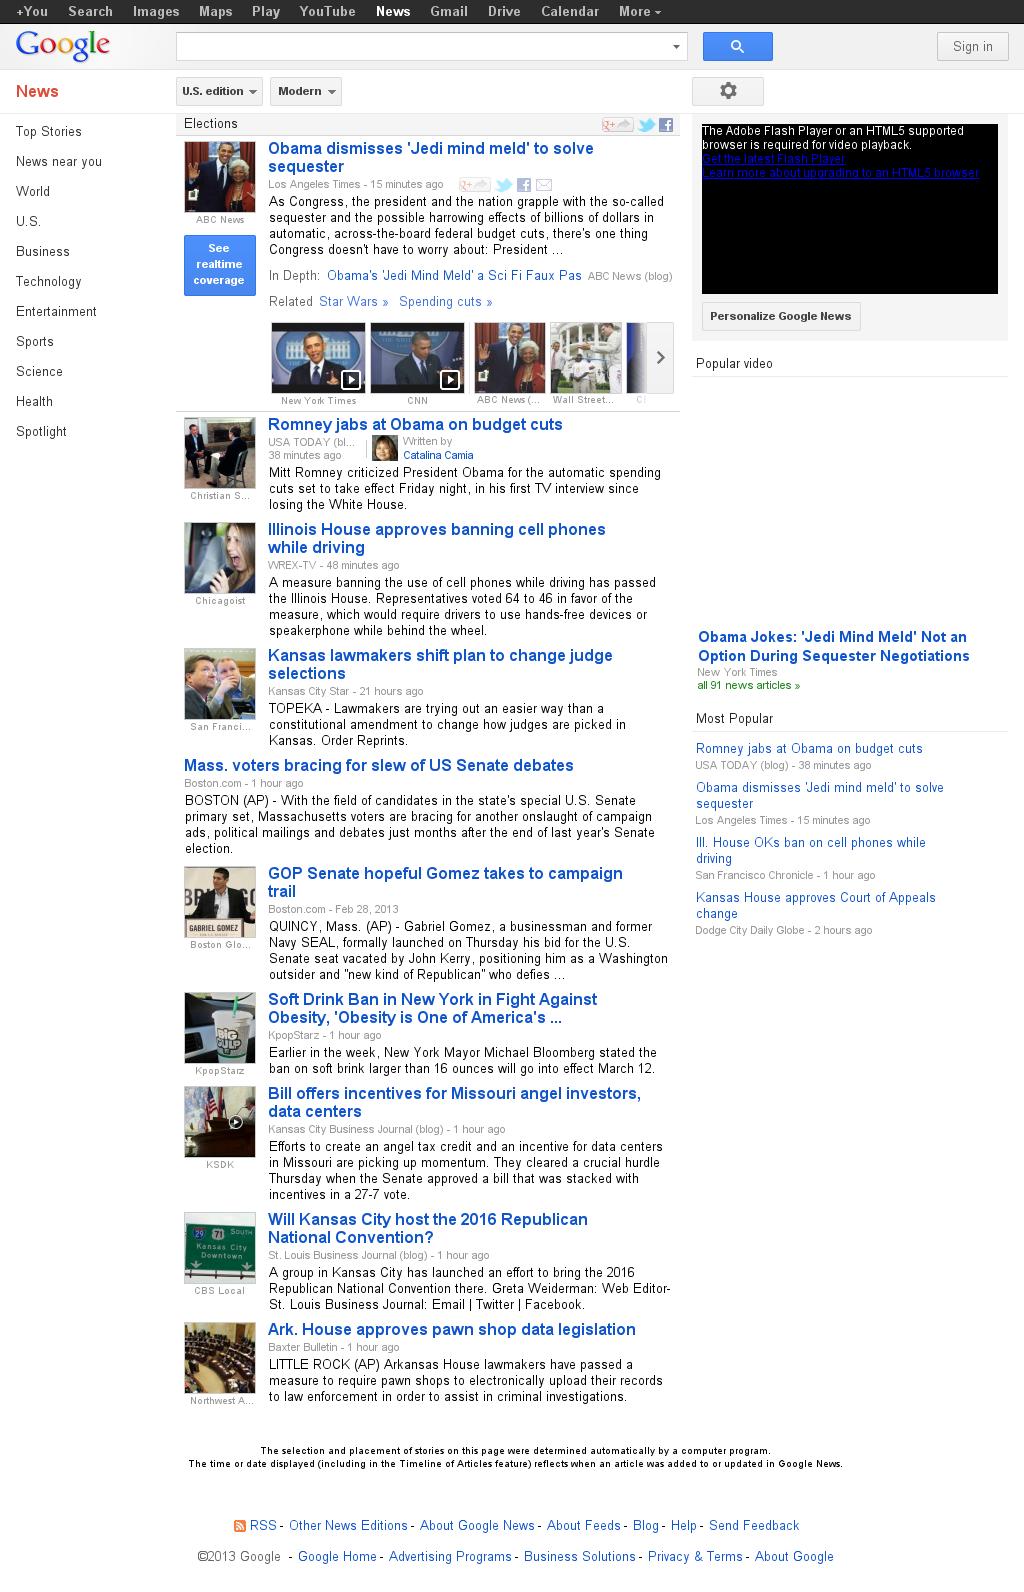 Google News: Elections at Friday March 1, 2013, 10:07 p.m. UTC